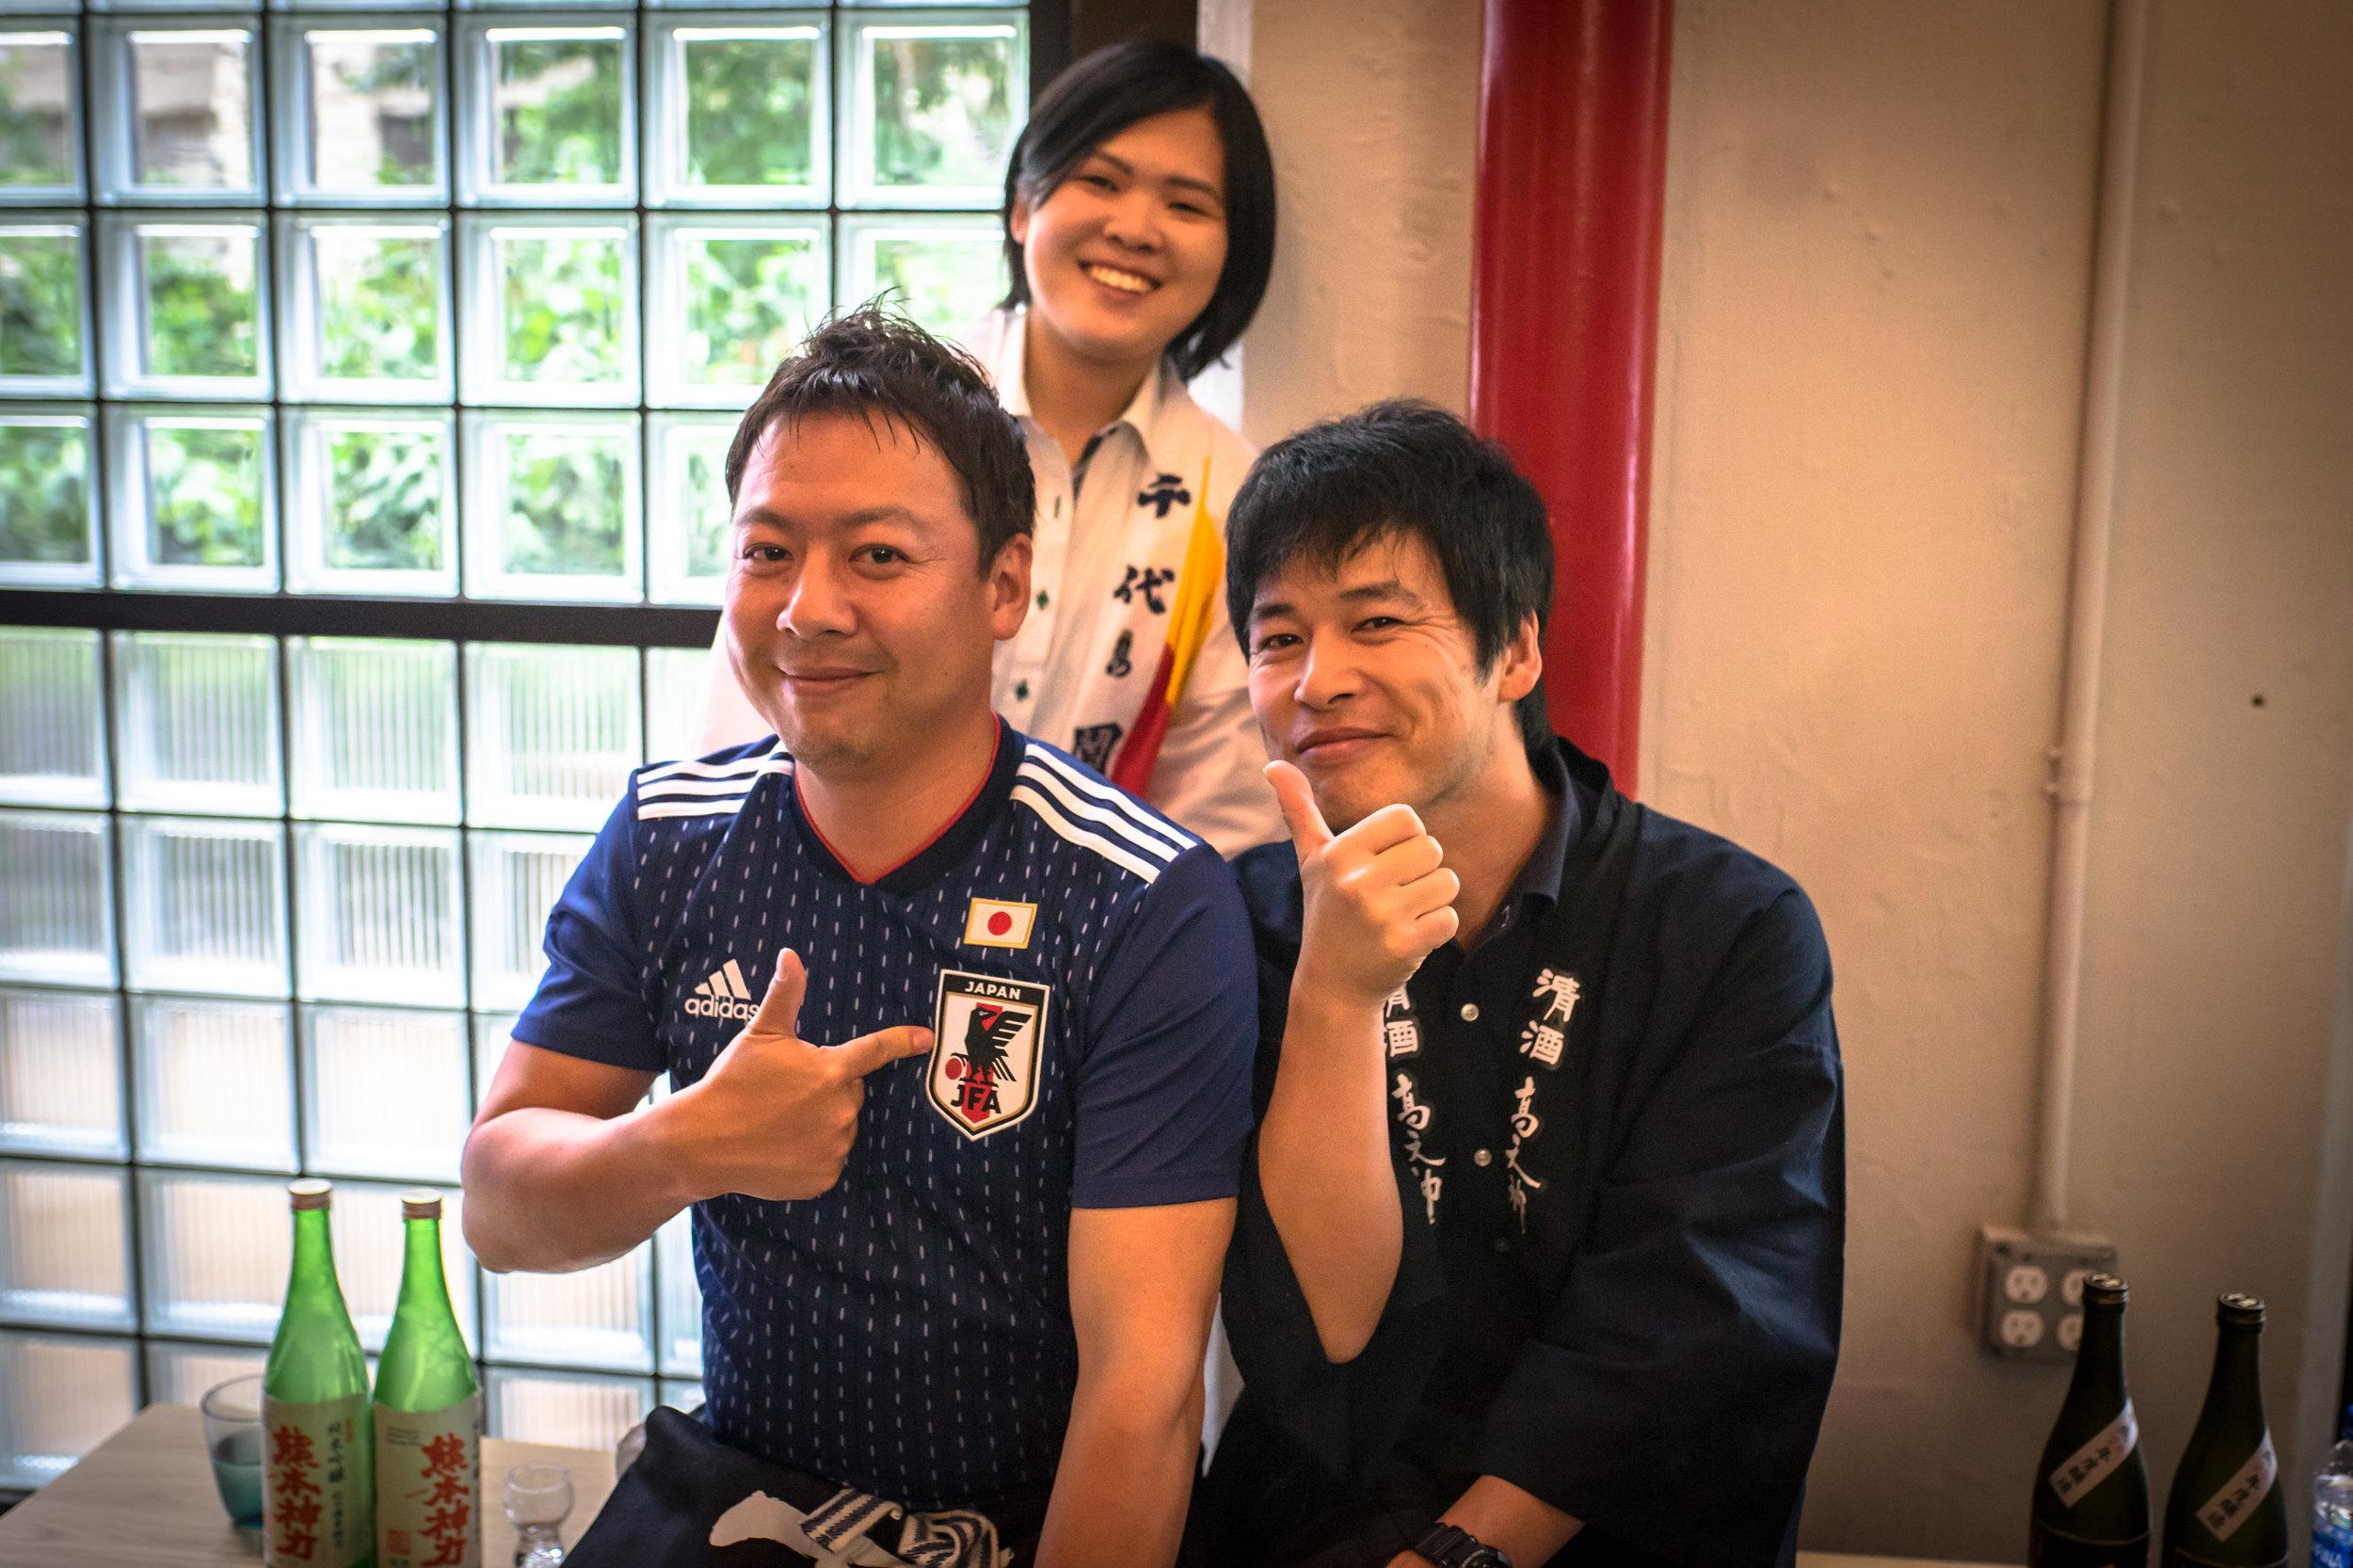 Sake brewers, Kensuke Shichida, Yaichi Doi, and Yuri Honda take a moment to relax after pouring sake for thirsty customers